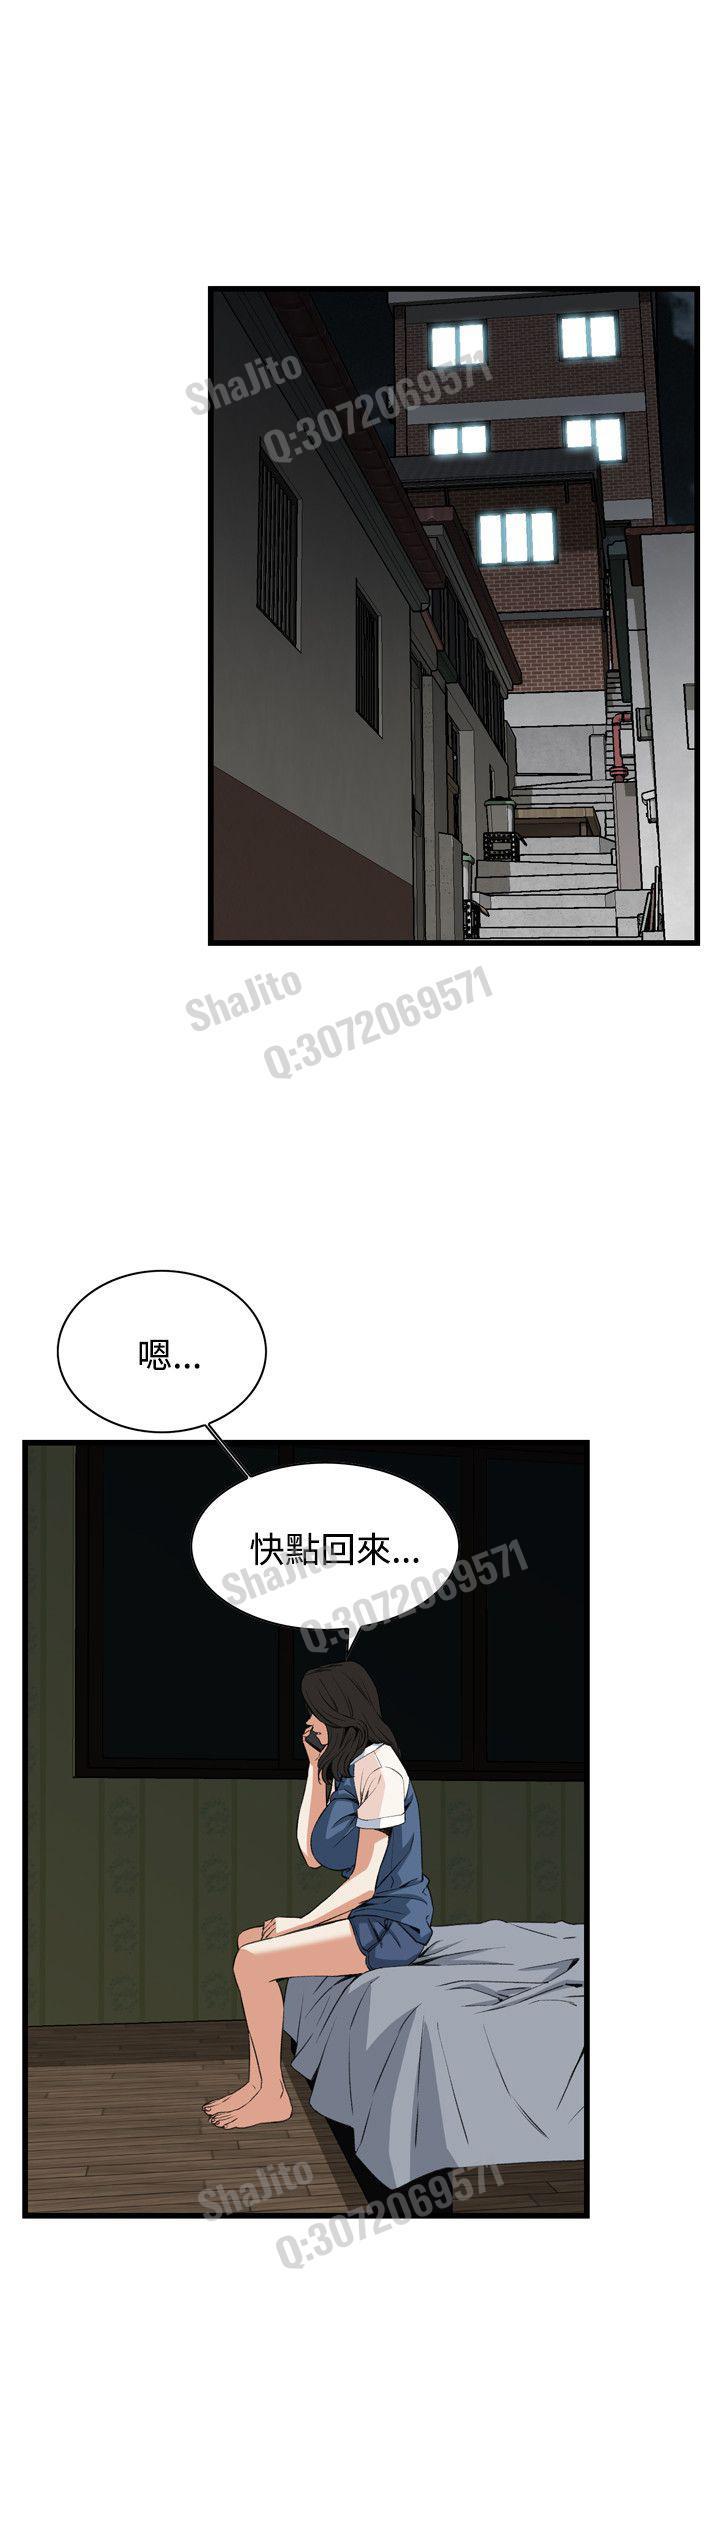 Take a peek 偷窥67-69 Chinese 48